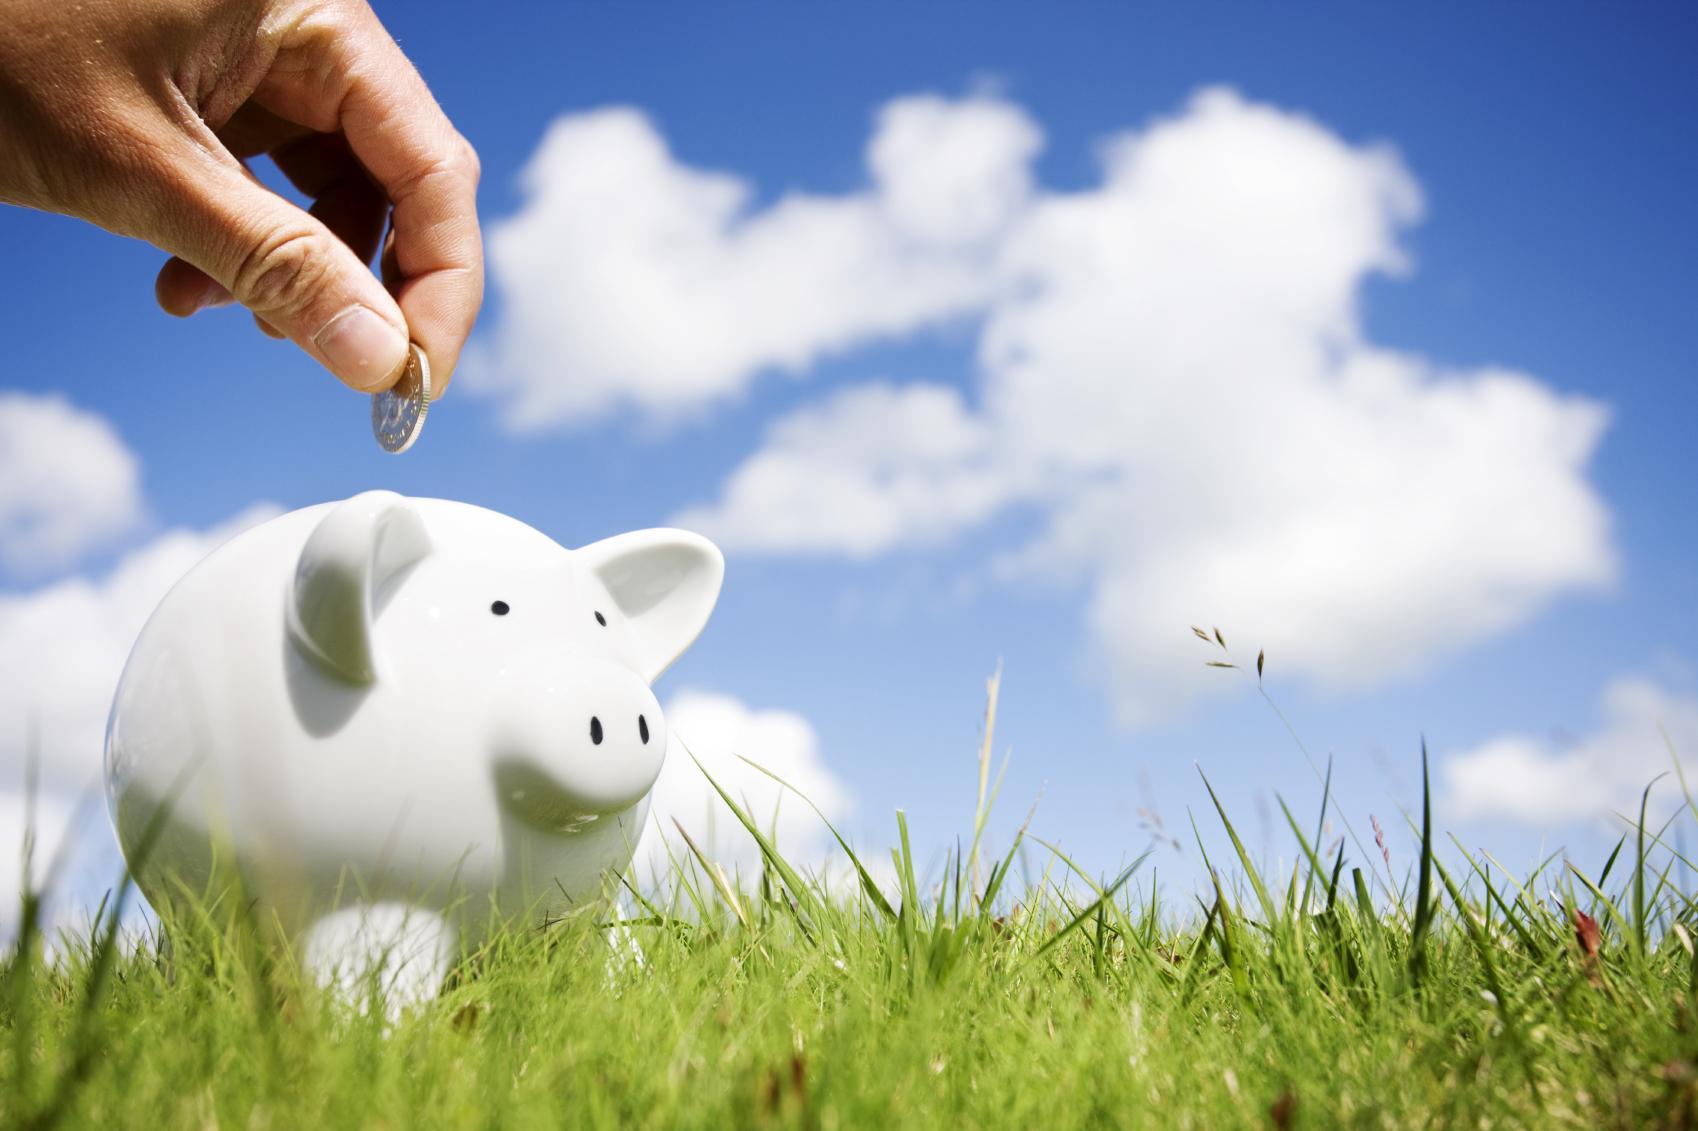 Summer-savings-4-ways-to-save-money-during-the-summer.jpg